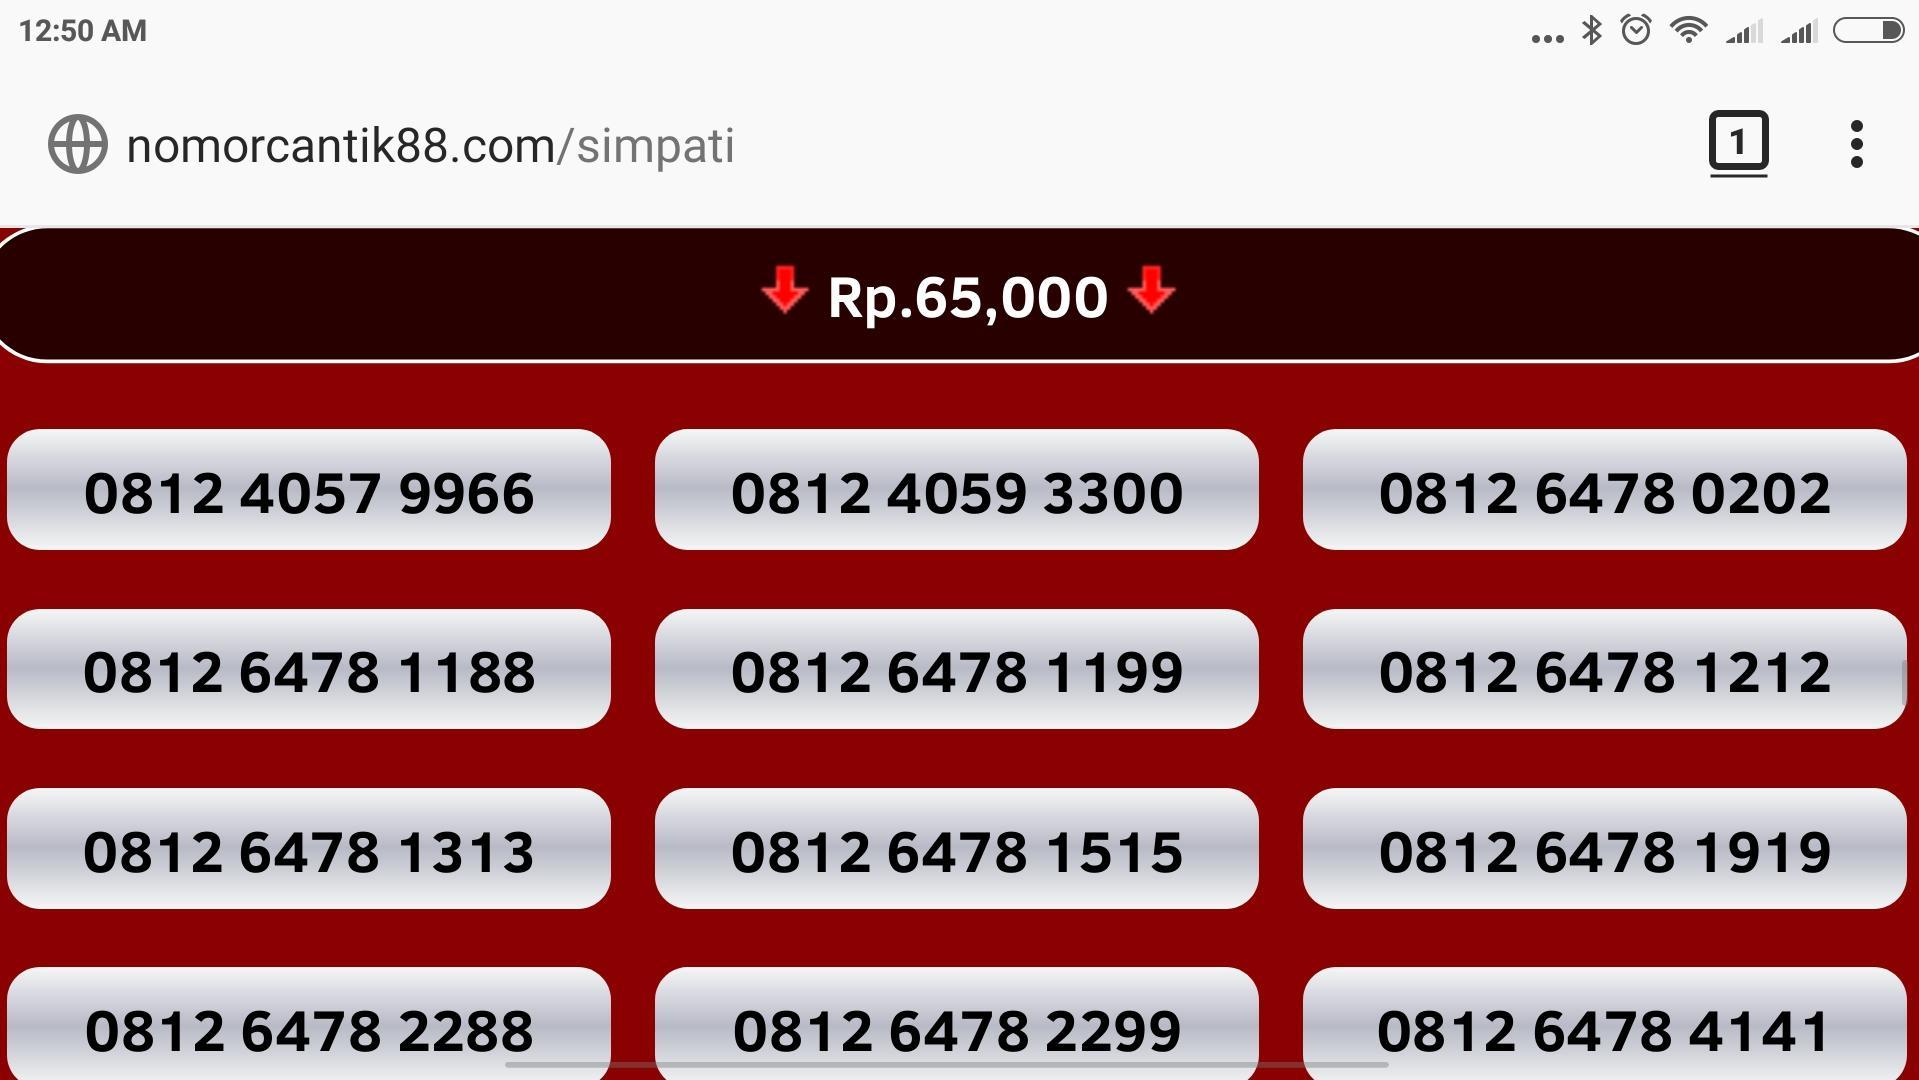 Nomor cantik simpati kartu perdana telkomsel nocan gsm murah 3g 4g nomer hoki prabayar internet nano